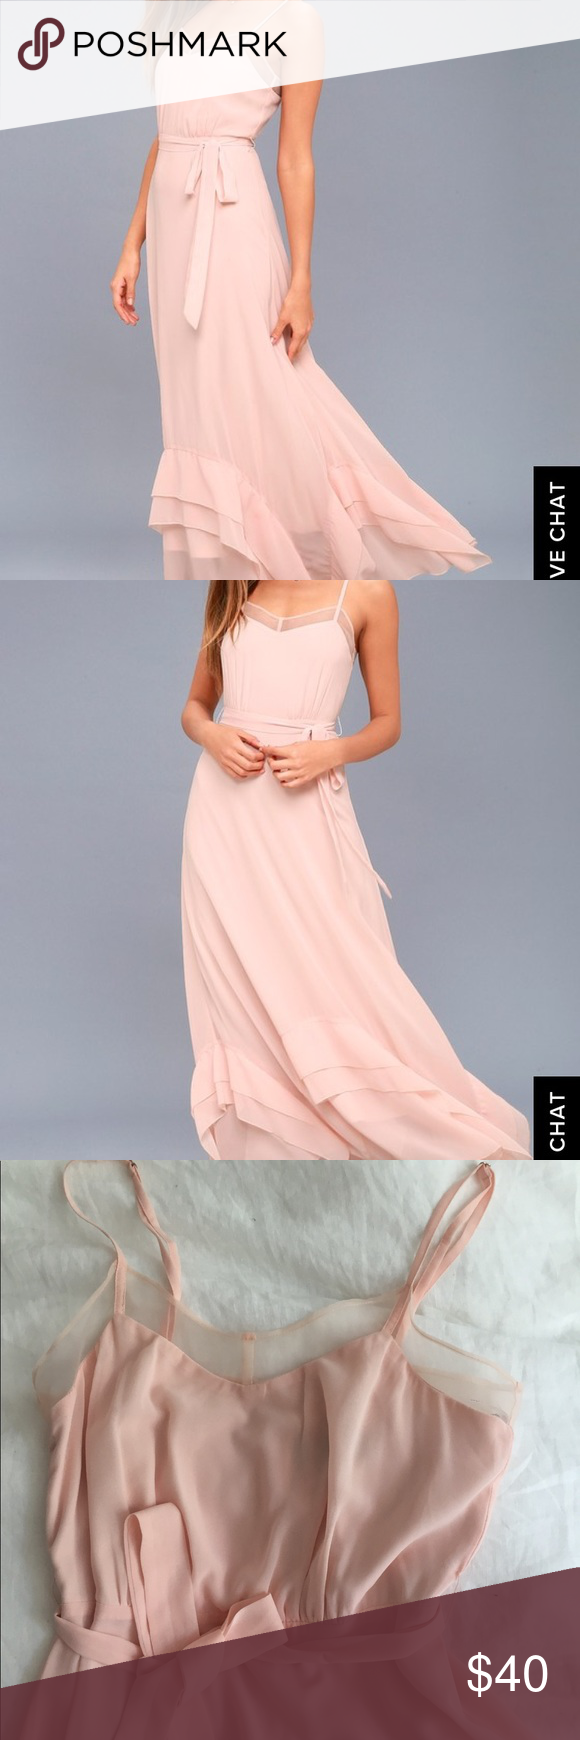 Lulus wedding guest dress  BlushLight pink dress in   My Posh Picks  Pinterest  Dresses